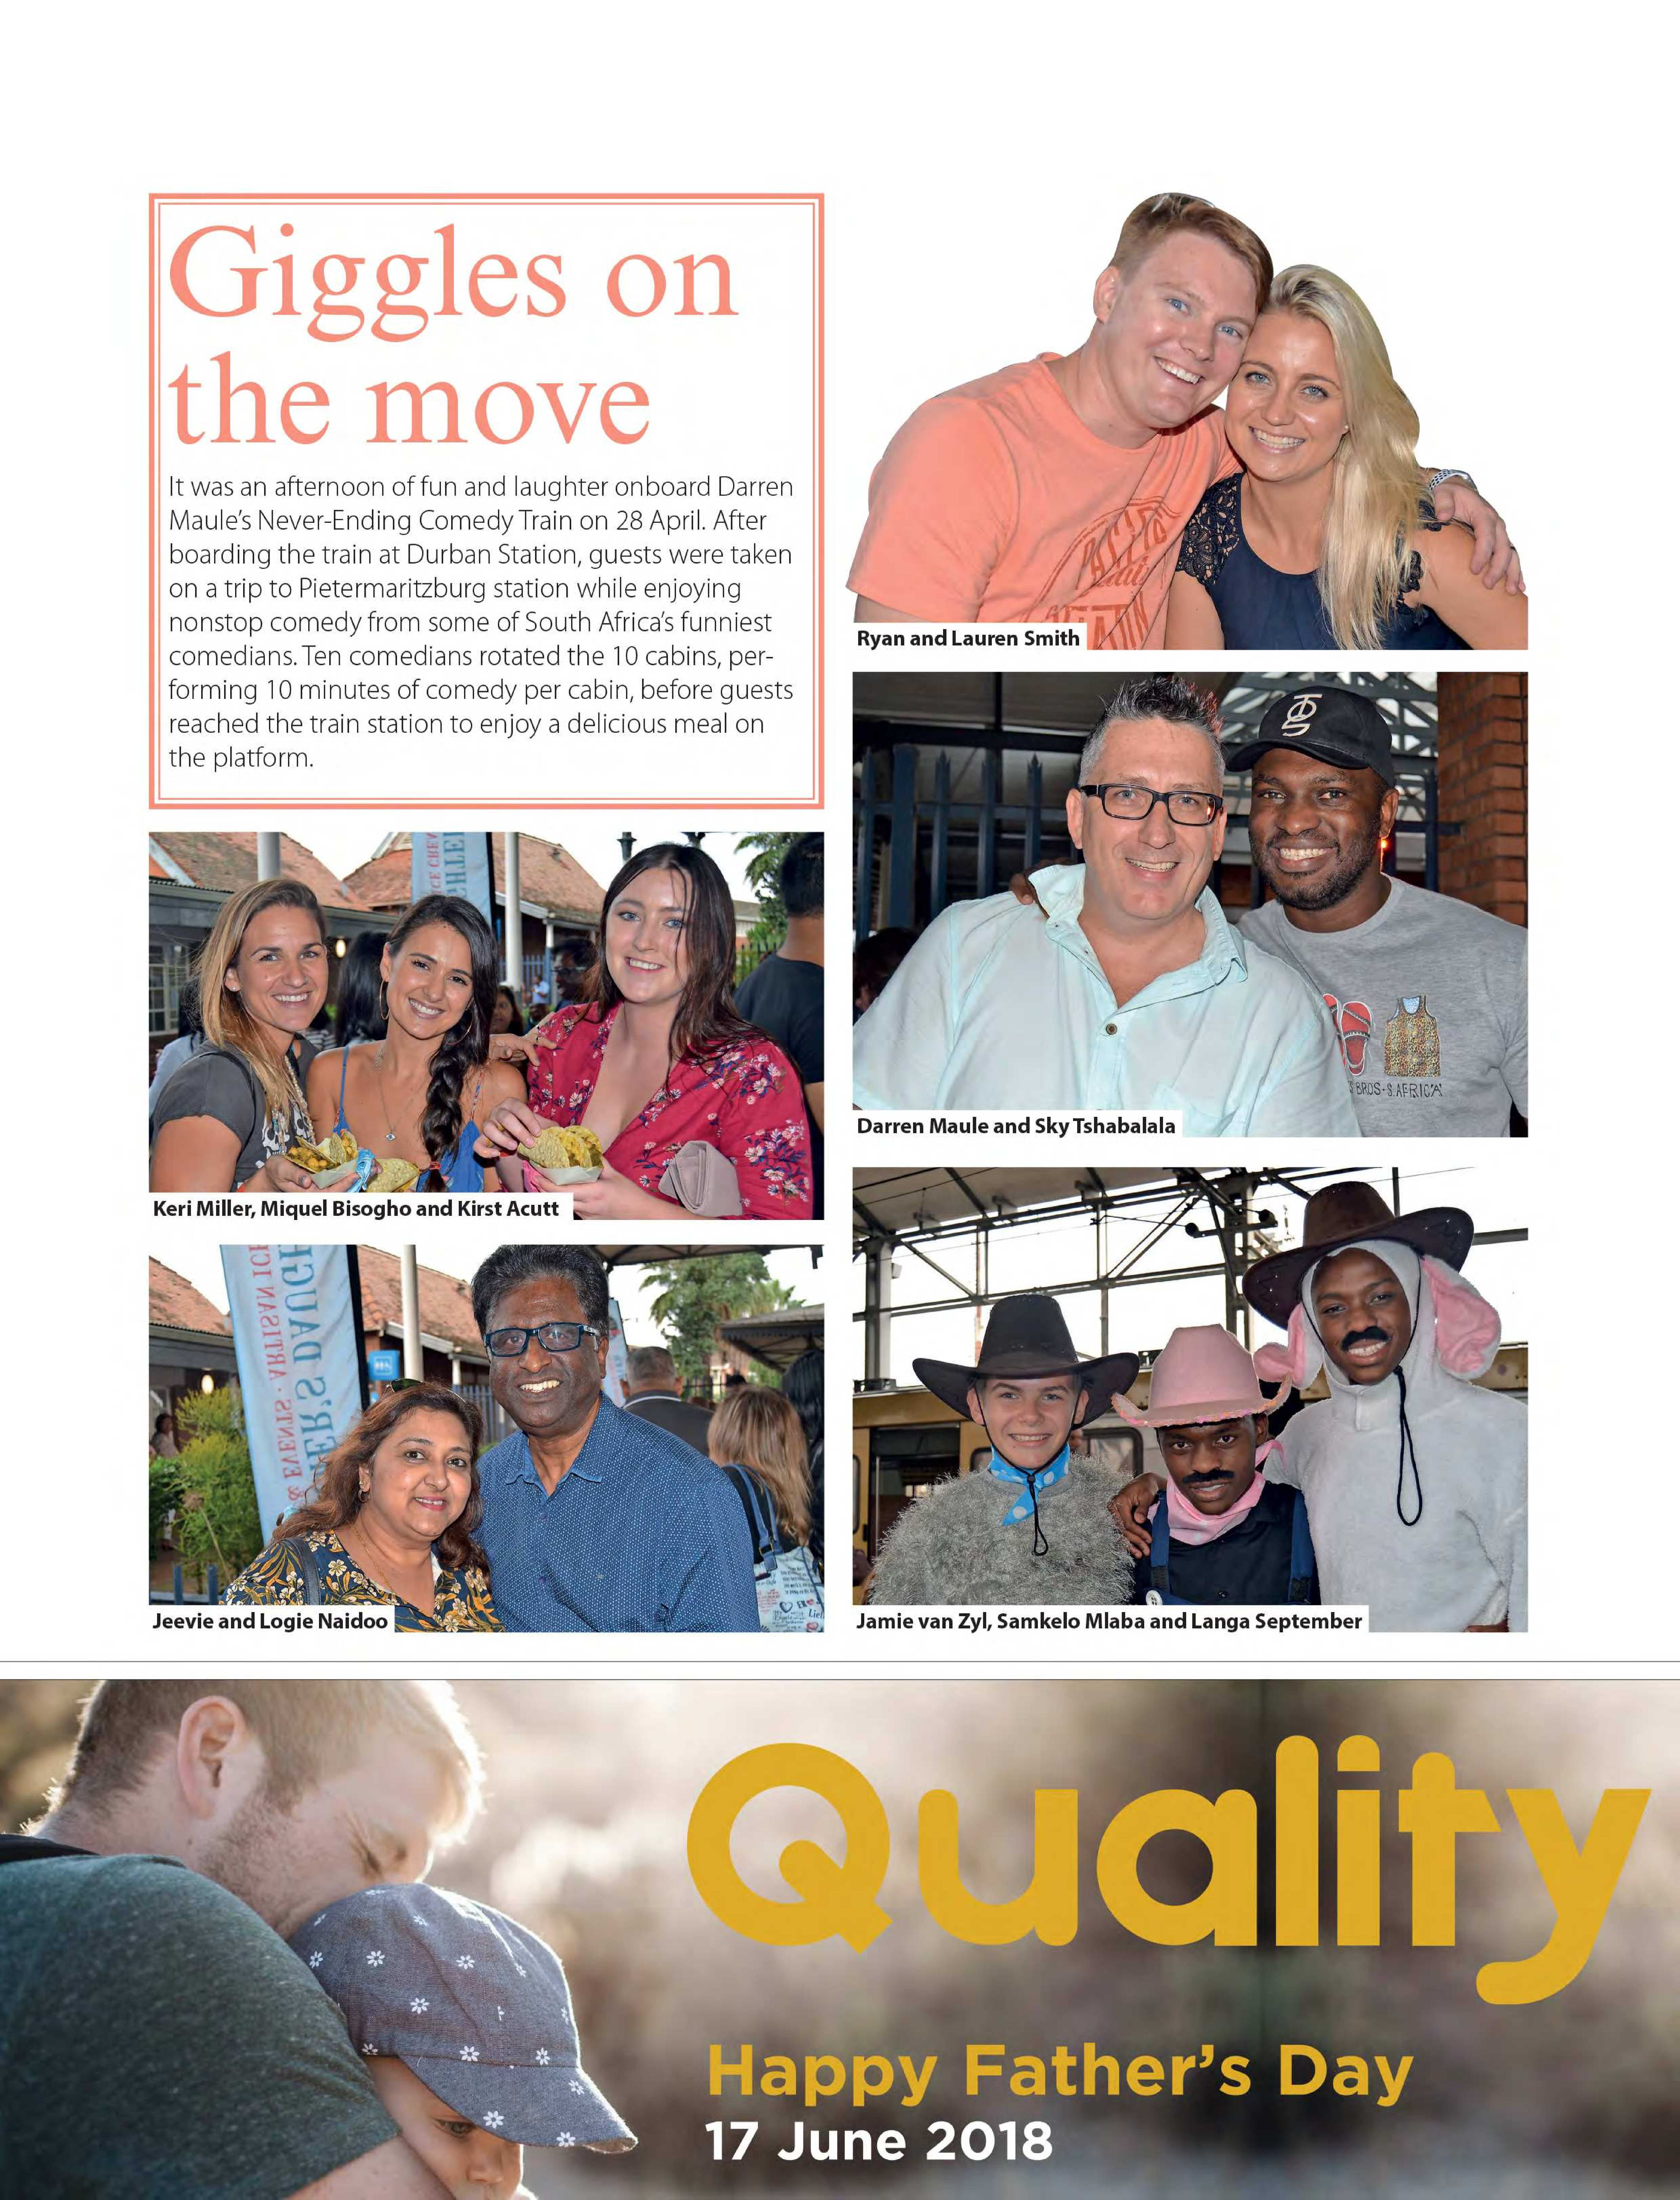 get-magazine-ballitoumhlanga-june-2018-epapers-page-10